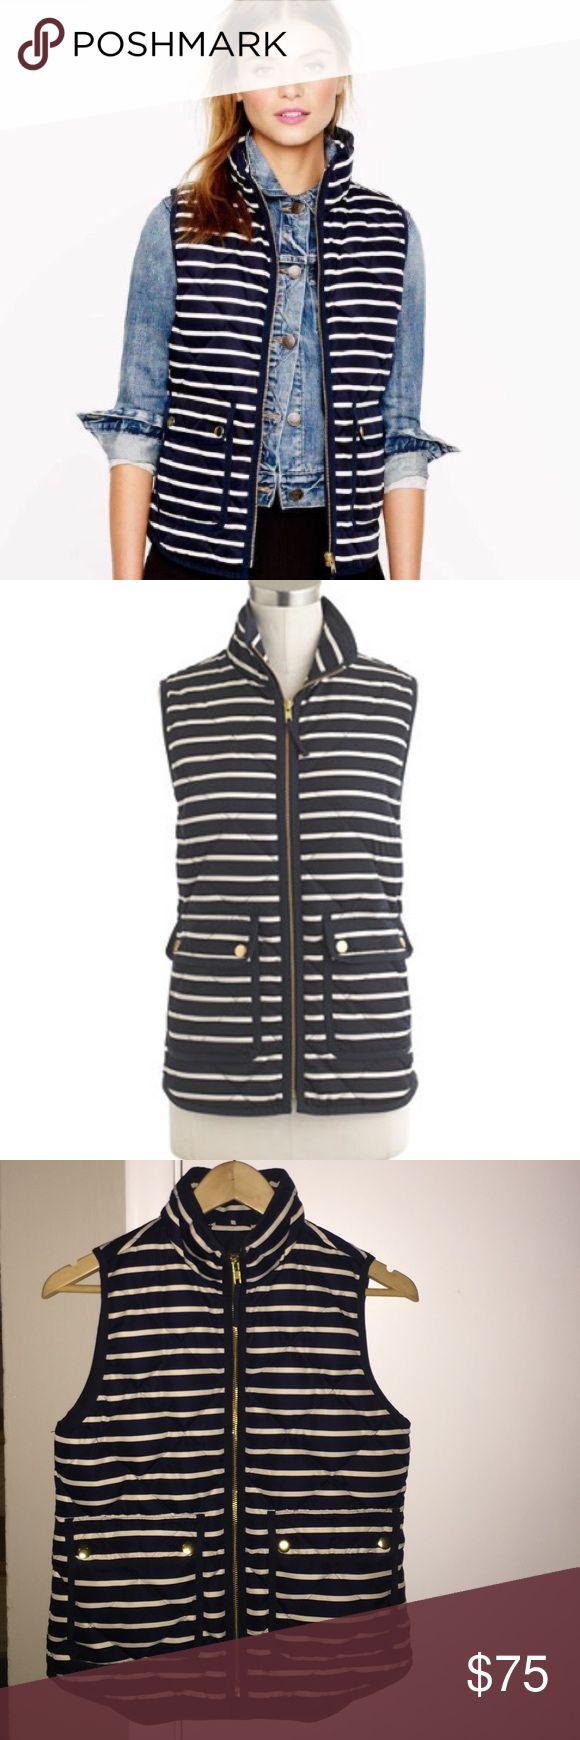 J. Crew Striped Vest 🌀Worn a few times 🌀Size XXS but fits more like XS/S J. Crew Jackets & Coats Vests